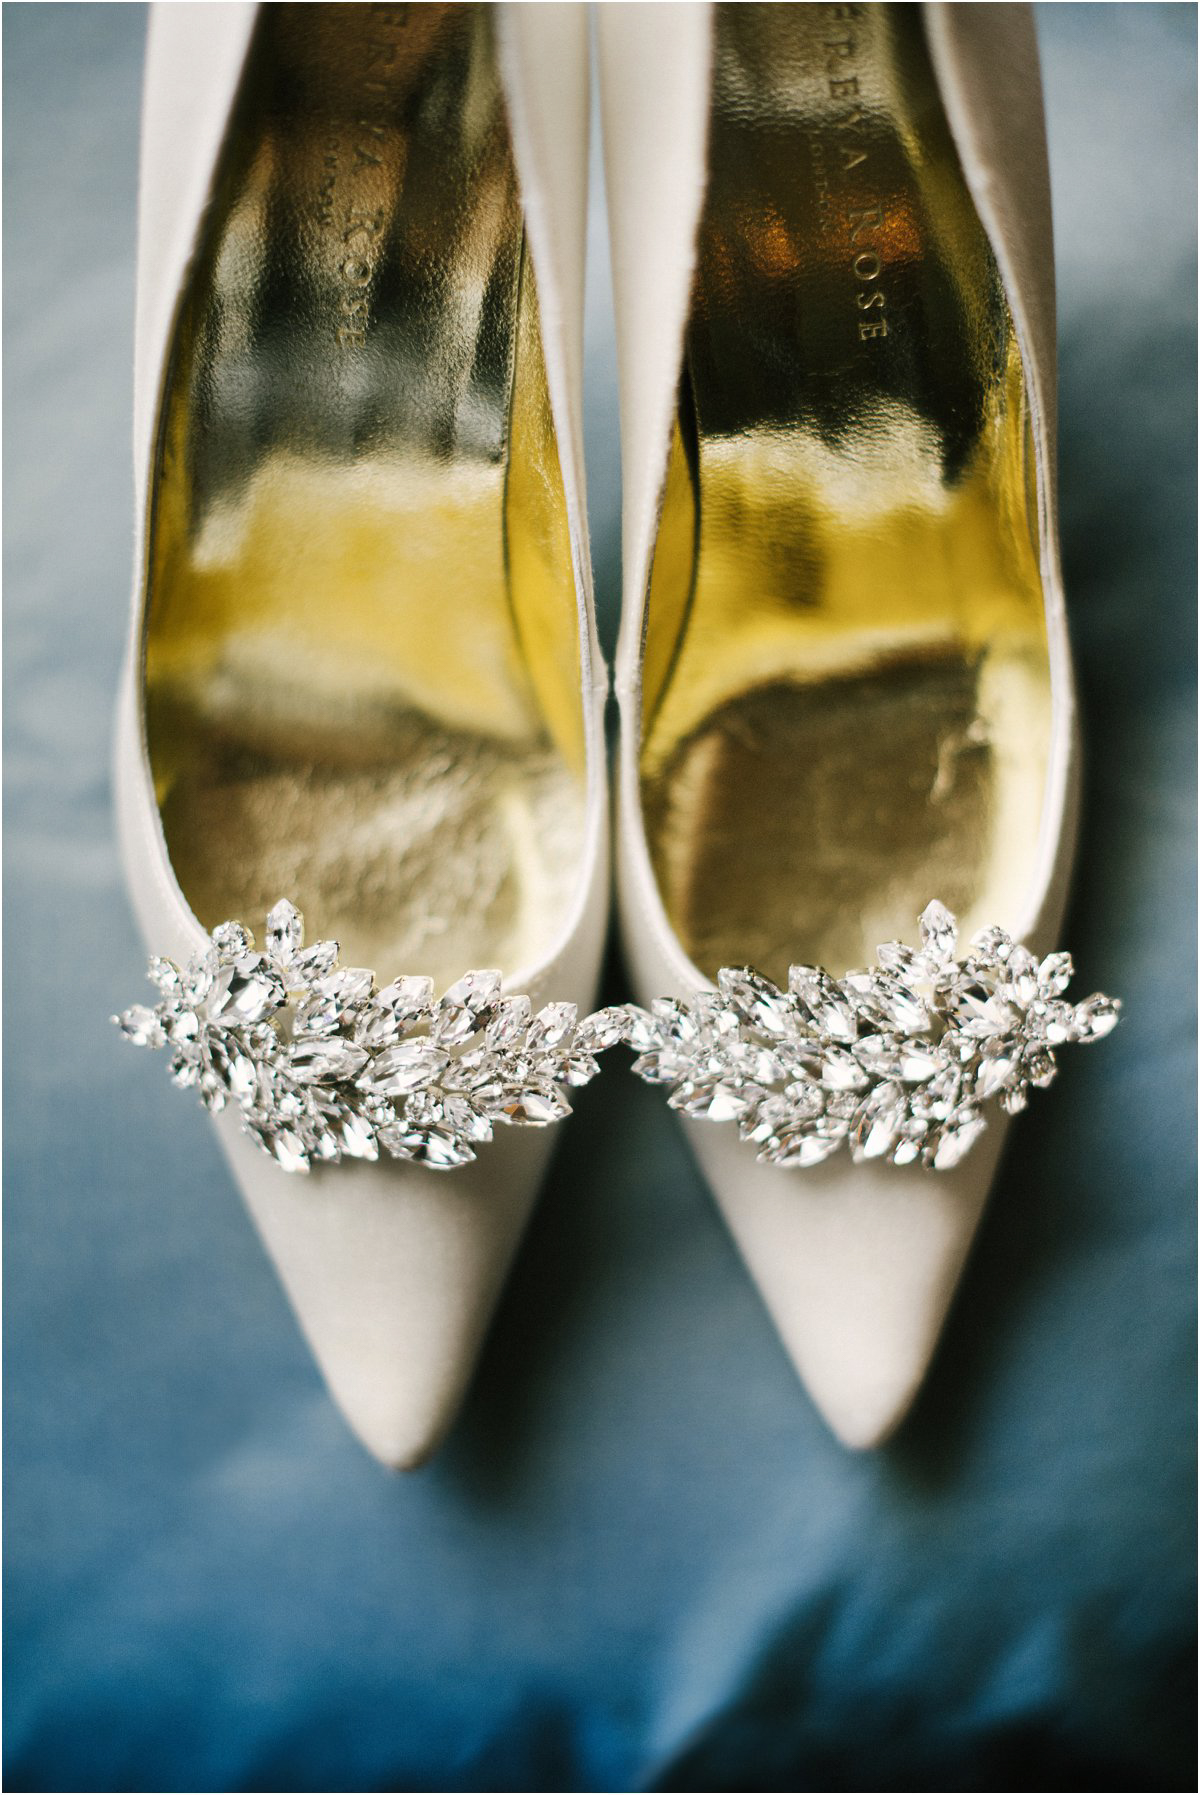 Crofts&Kowalczyk_DundasCastle_WeddingPhotography_Hannah&Tom-6.jpg